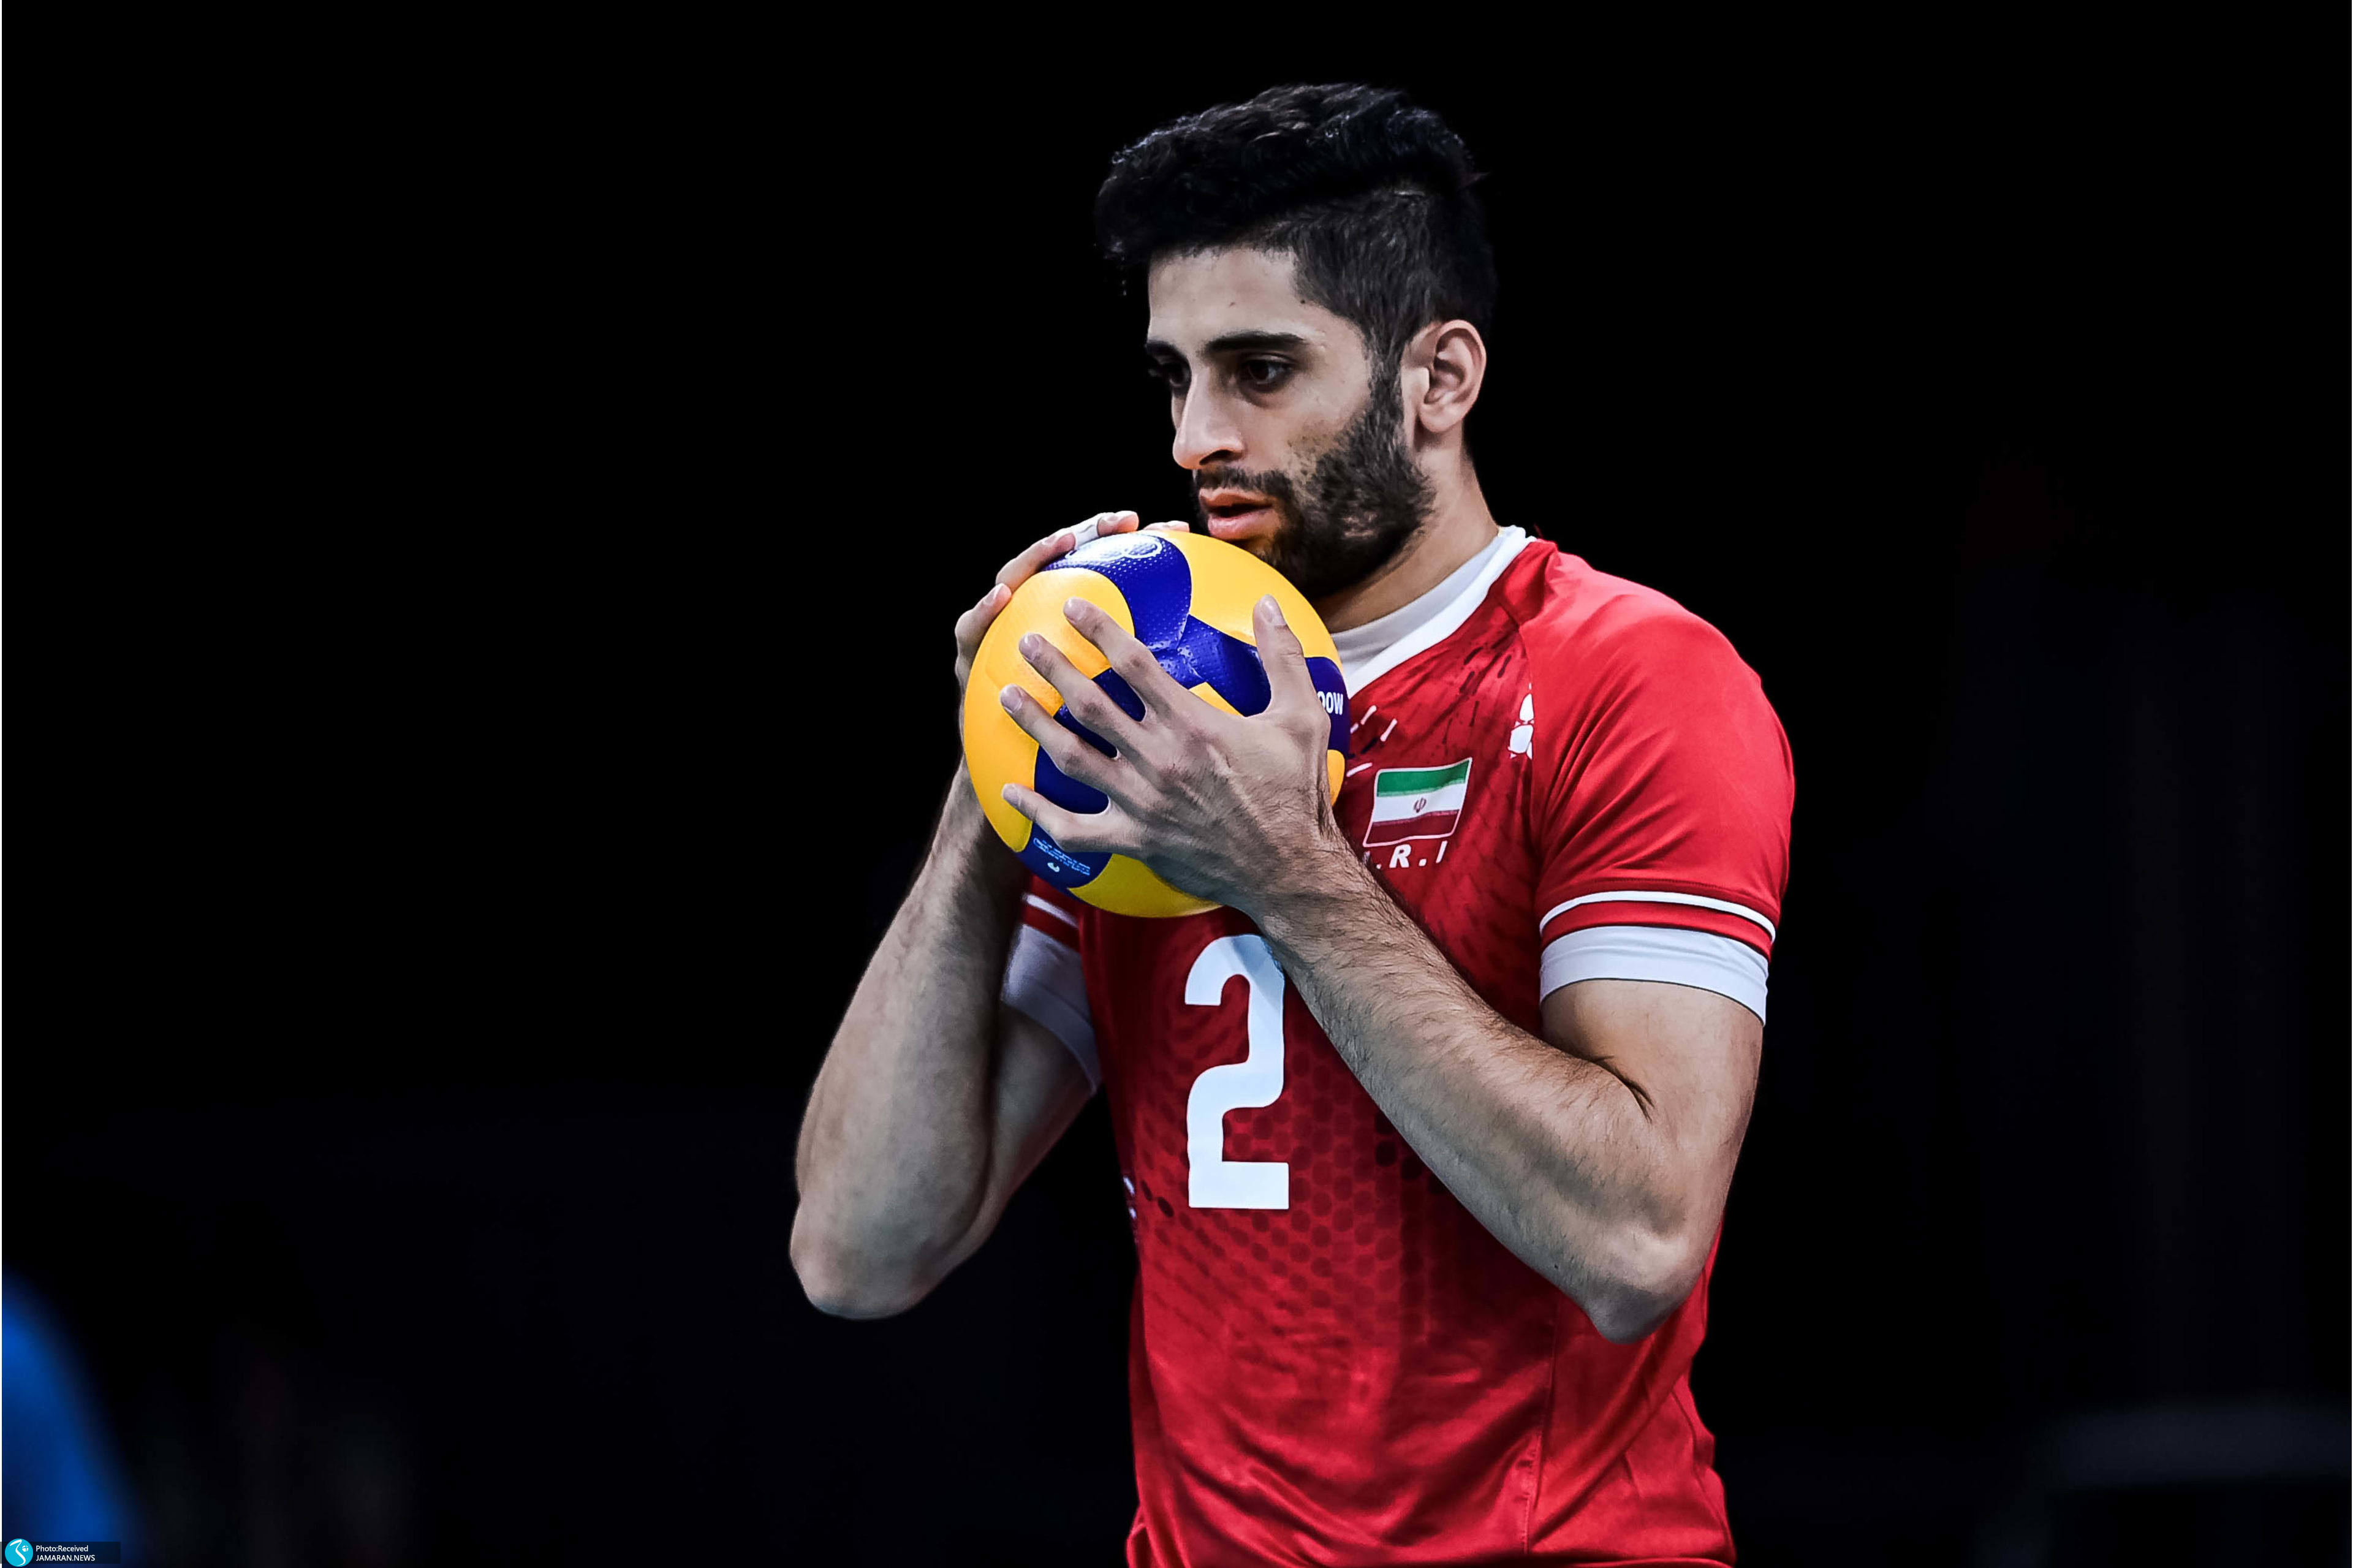 میلاد عبادی پور والیبال ایران و ونزوئلا در المپیک ۲۰۲۰ توکیو